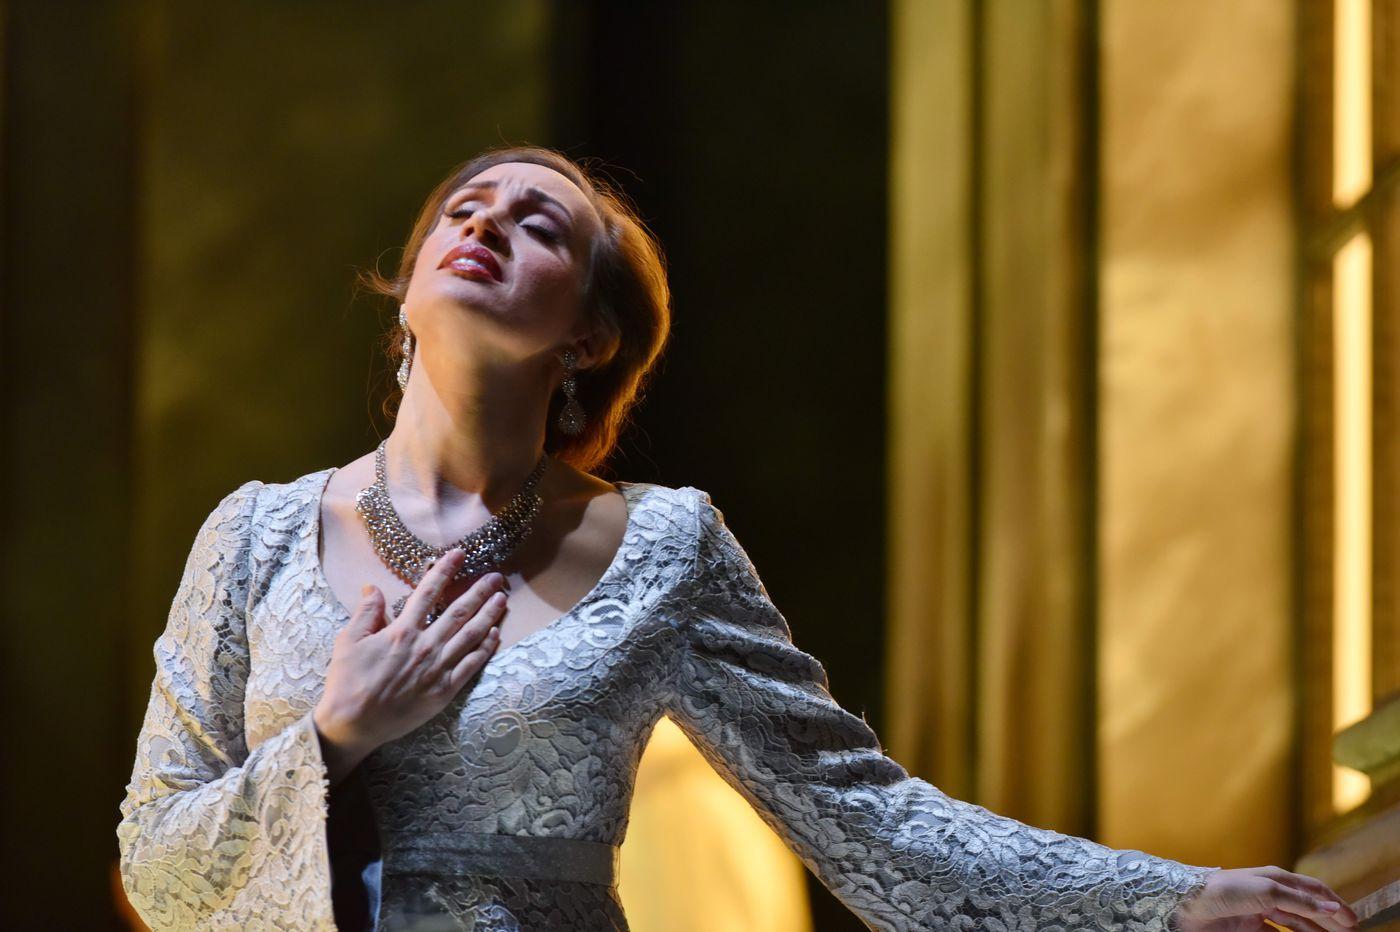 Opera Philadelphia's O18 festival is nearly here: Expect an audacious 10 days